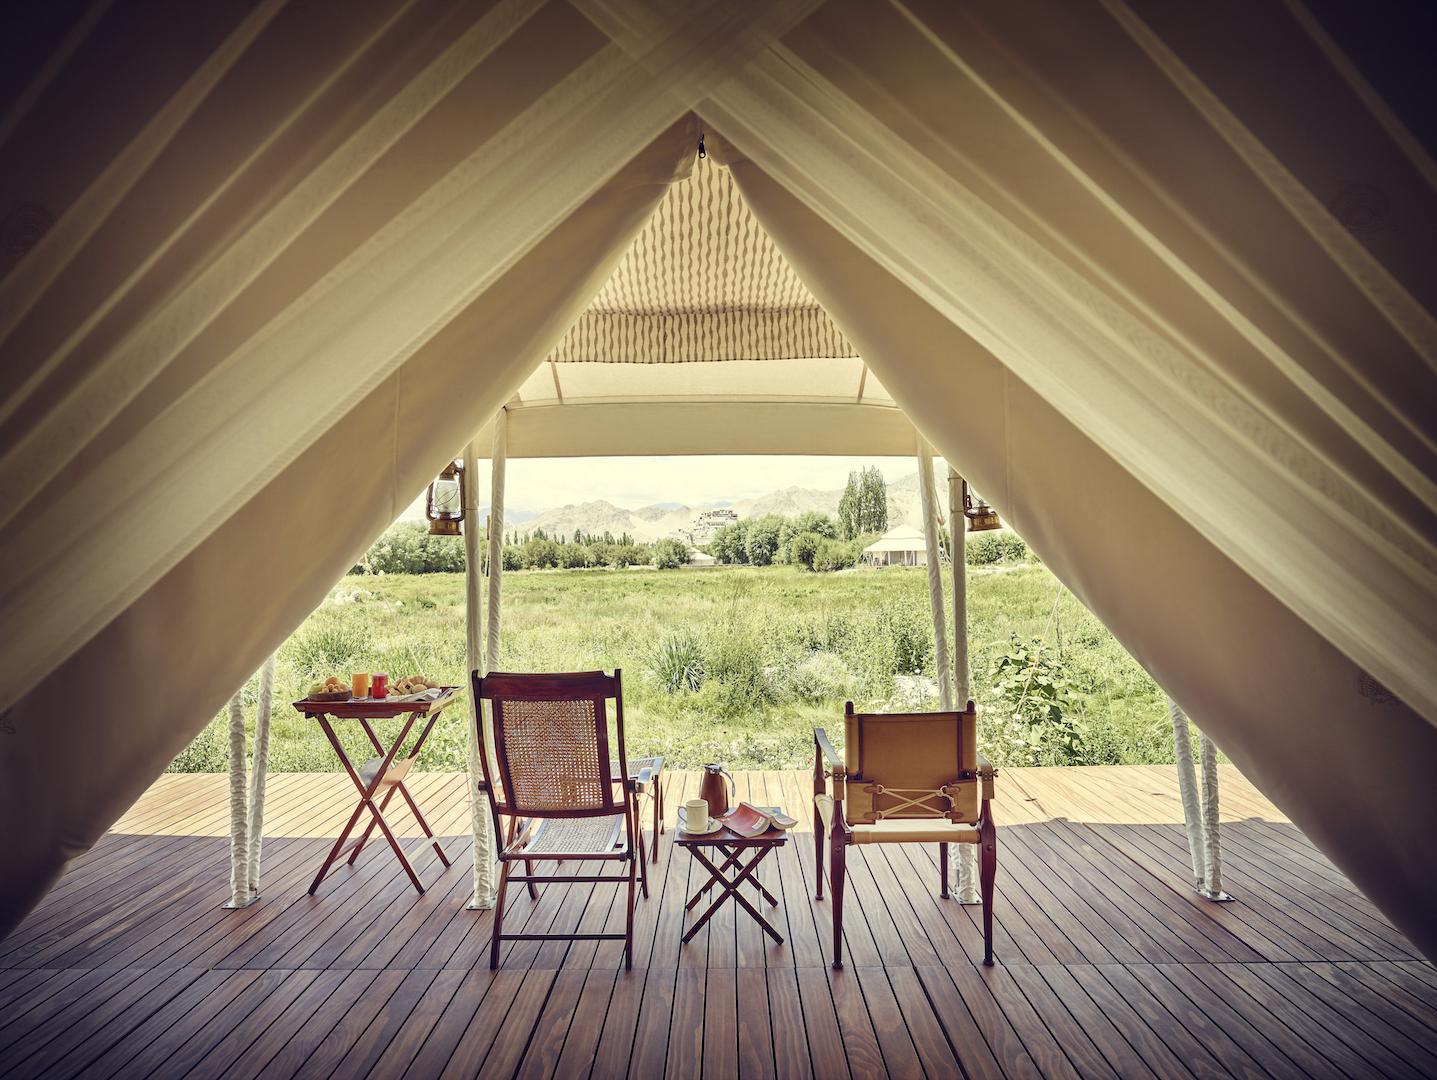 gt-luxury-suite-tent-white-verandah-01_highres.jpg